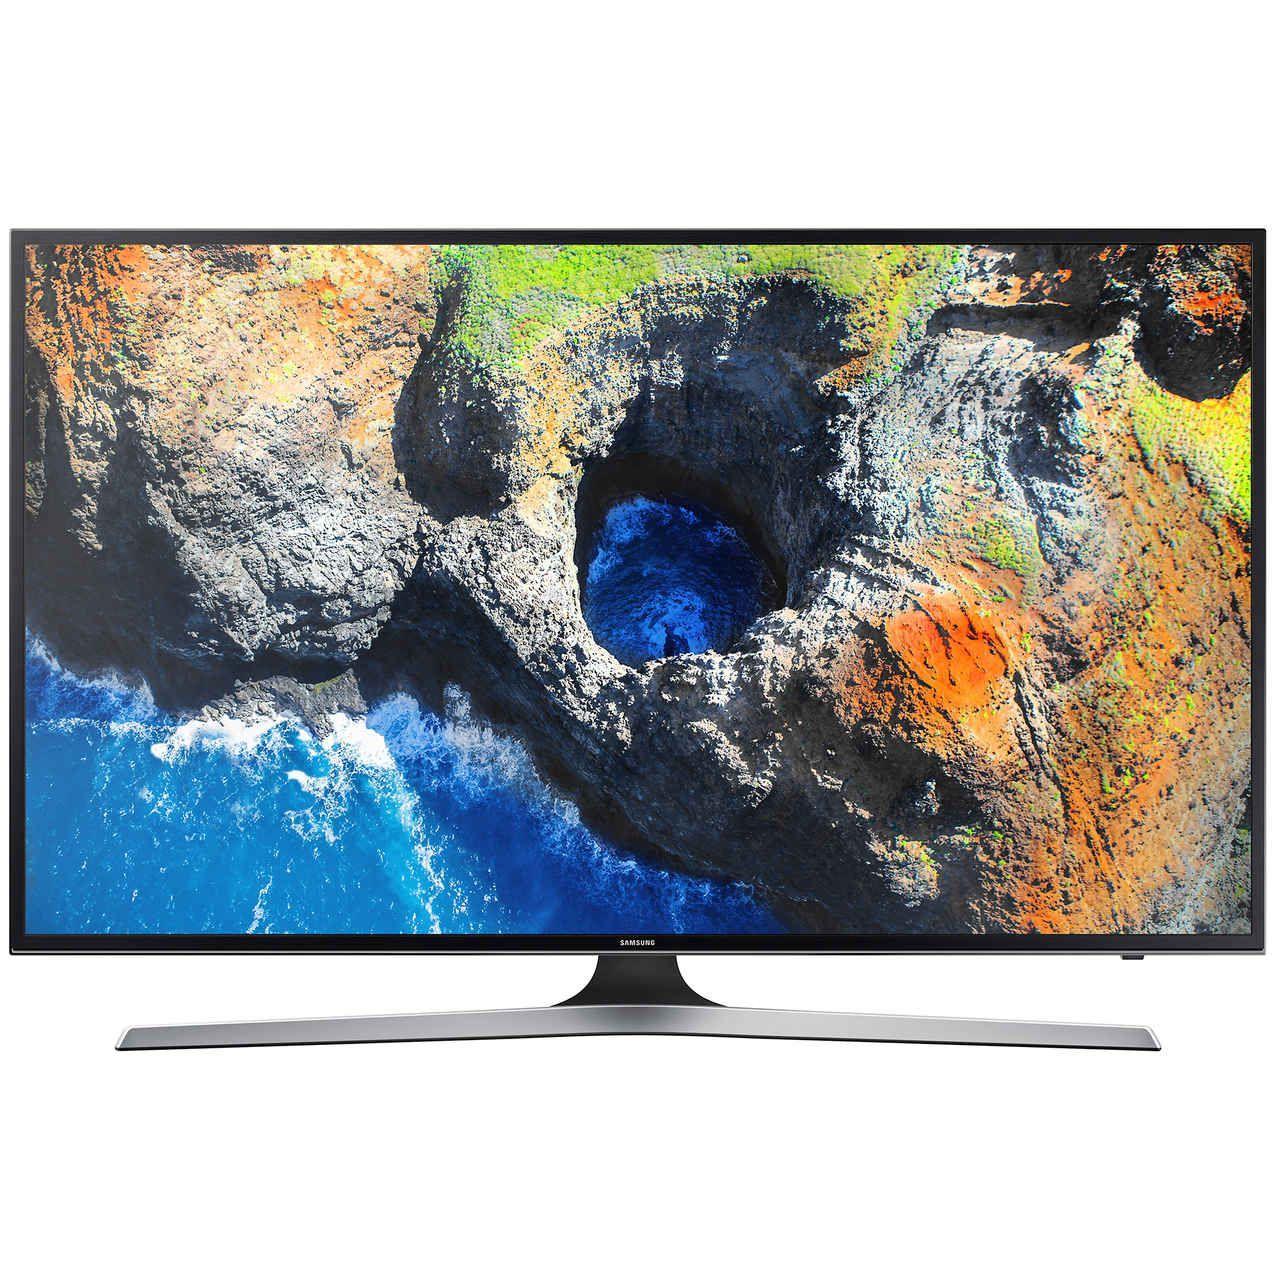 Телевизор Samsung UE43MU6172 (PQI 1300 Гц, Ultra HD 4K, Smart, Wi-Fi, DVB-T2/S2)